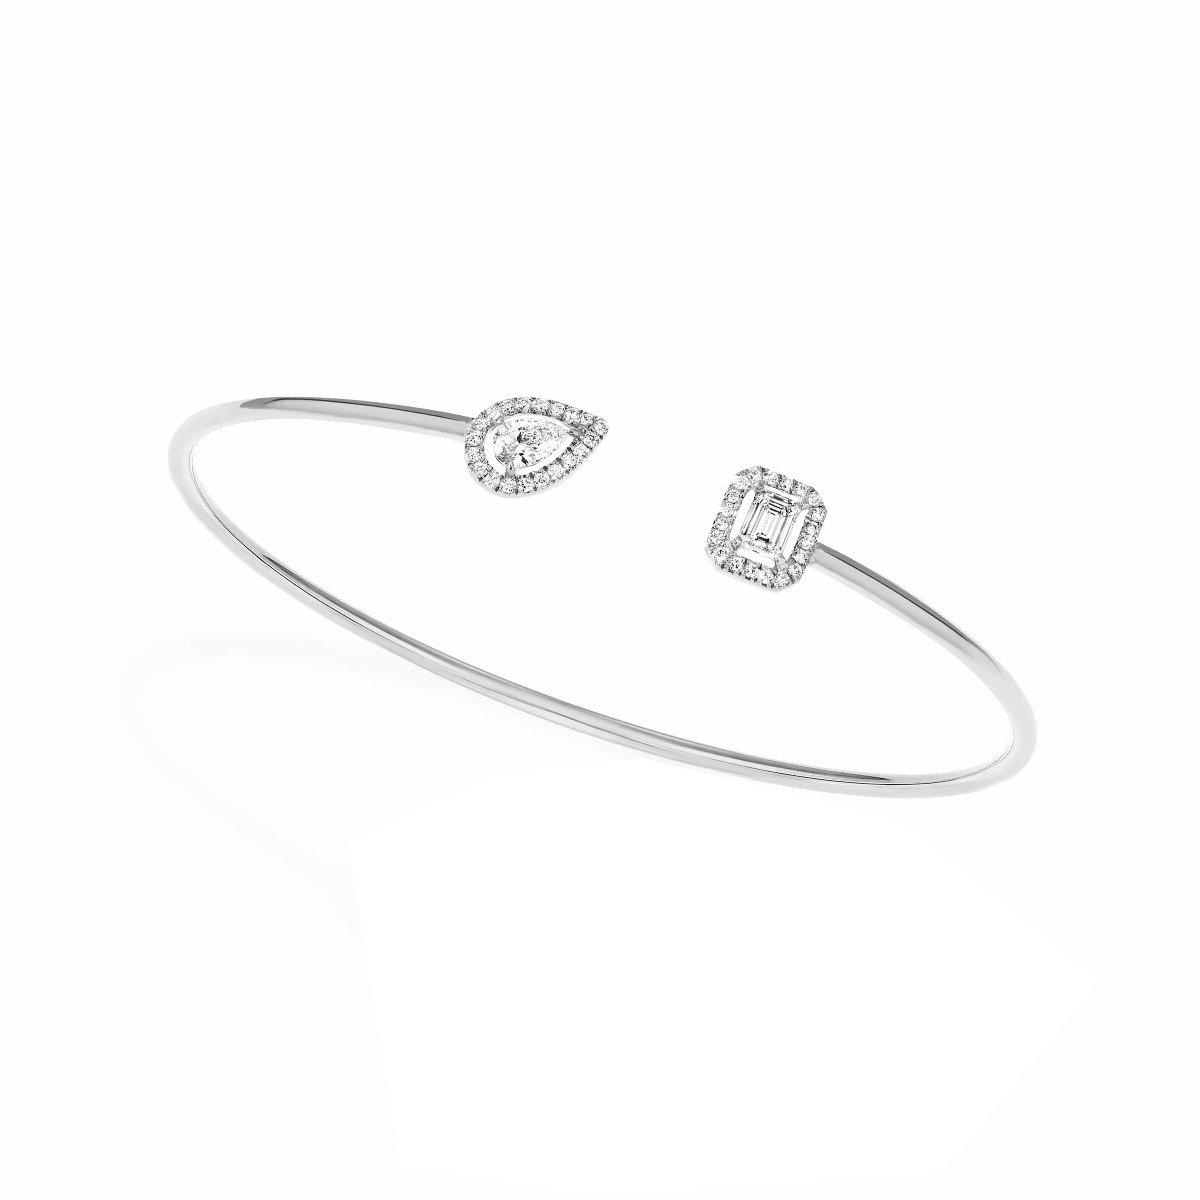 Bracelet jonc Messika My Twin Toi & Moi en or blanc et diamants vue 2